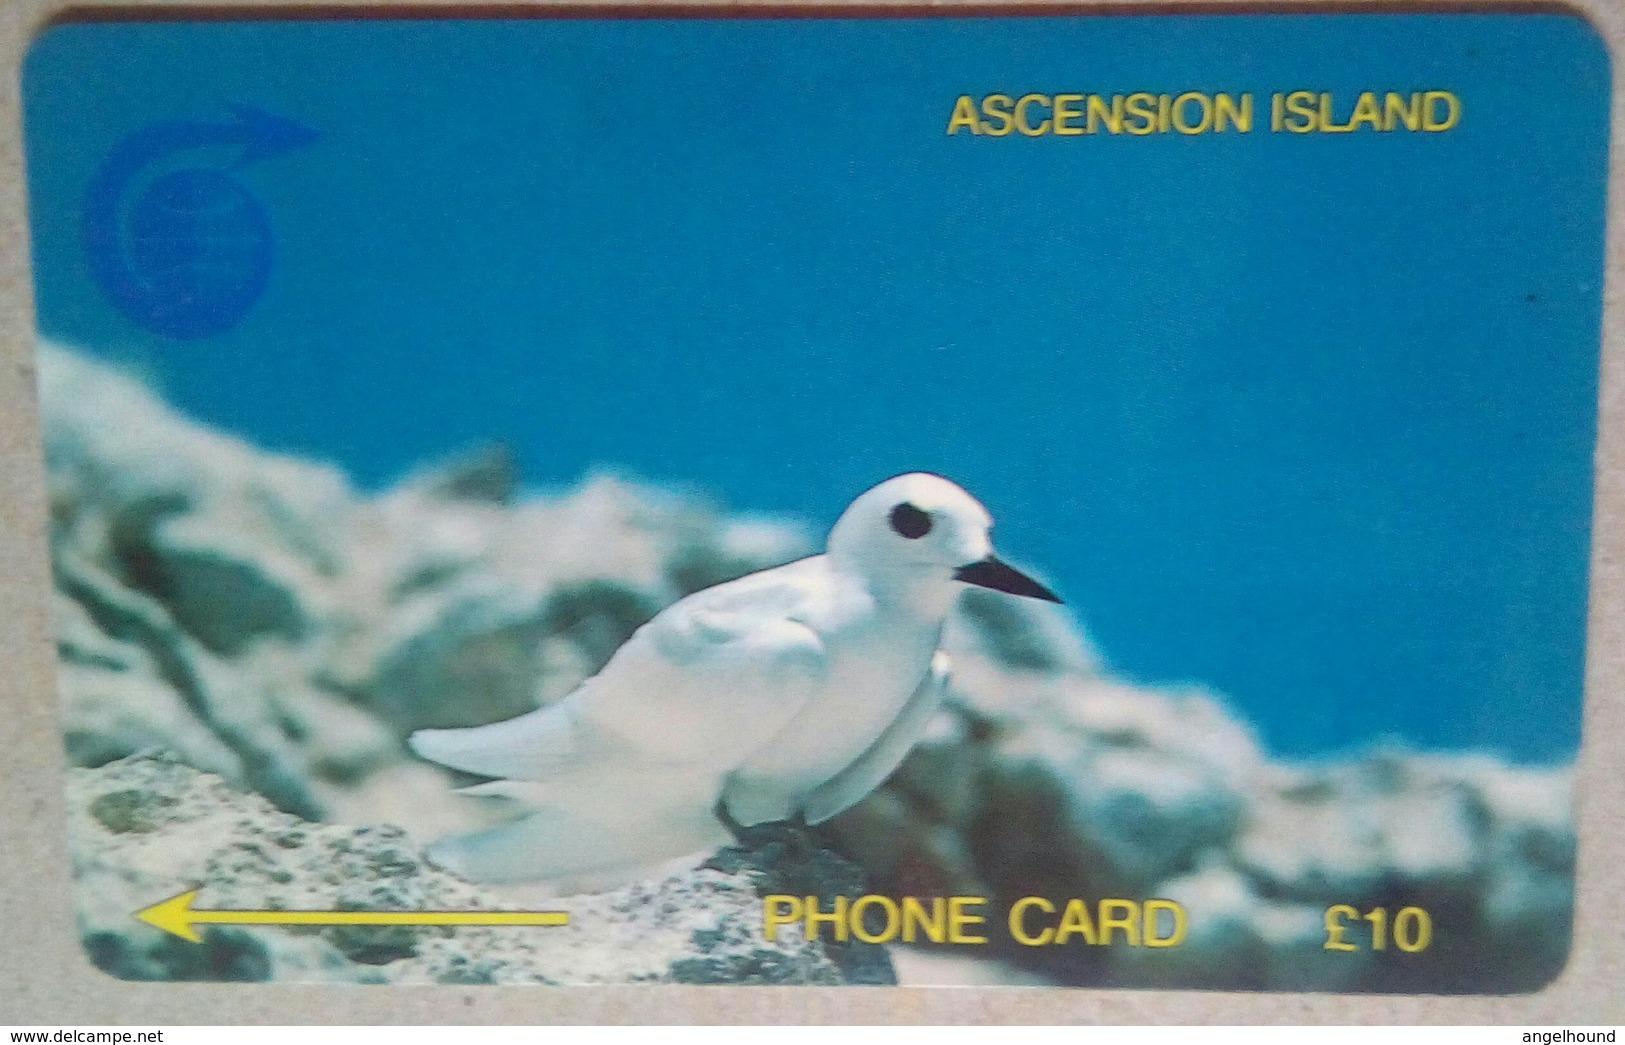 3CASB 10 Pounds - Ascension (Insel)